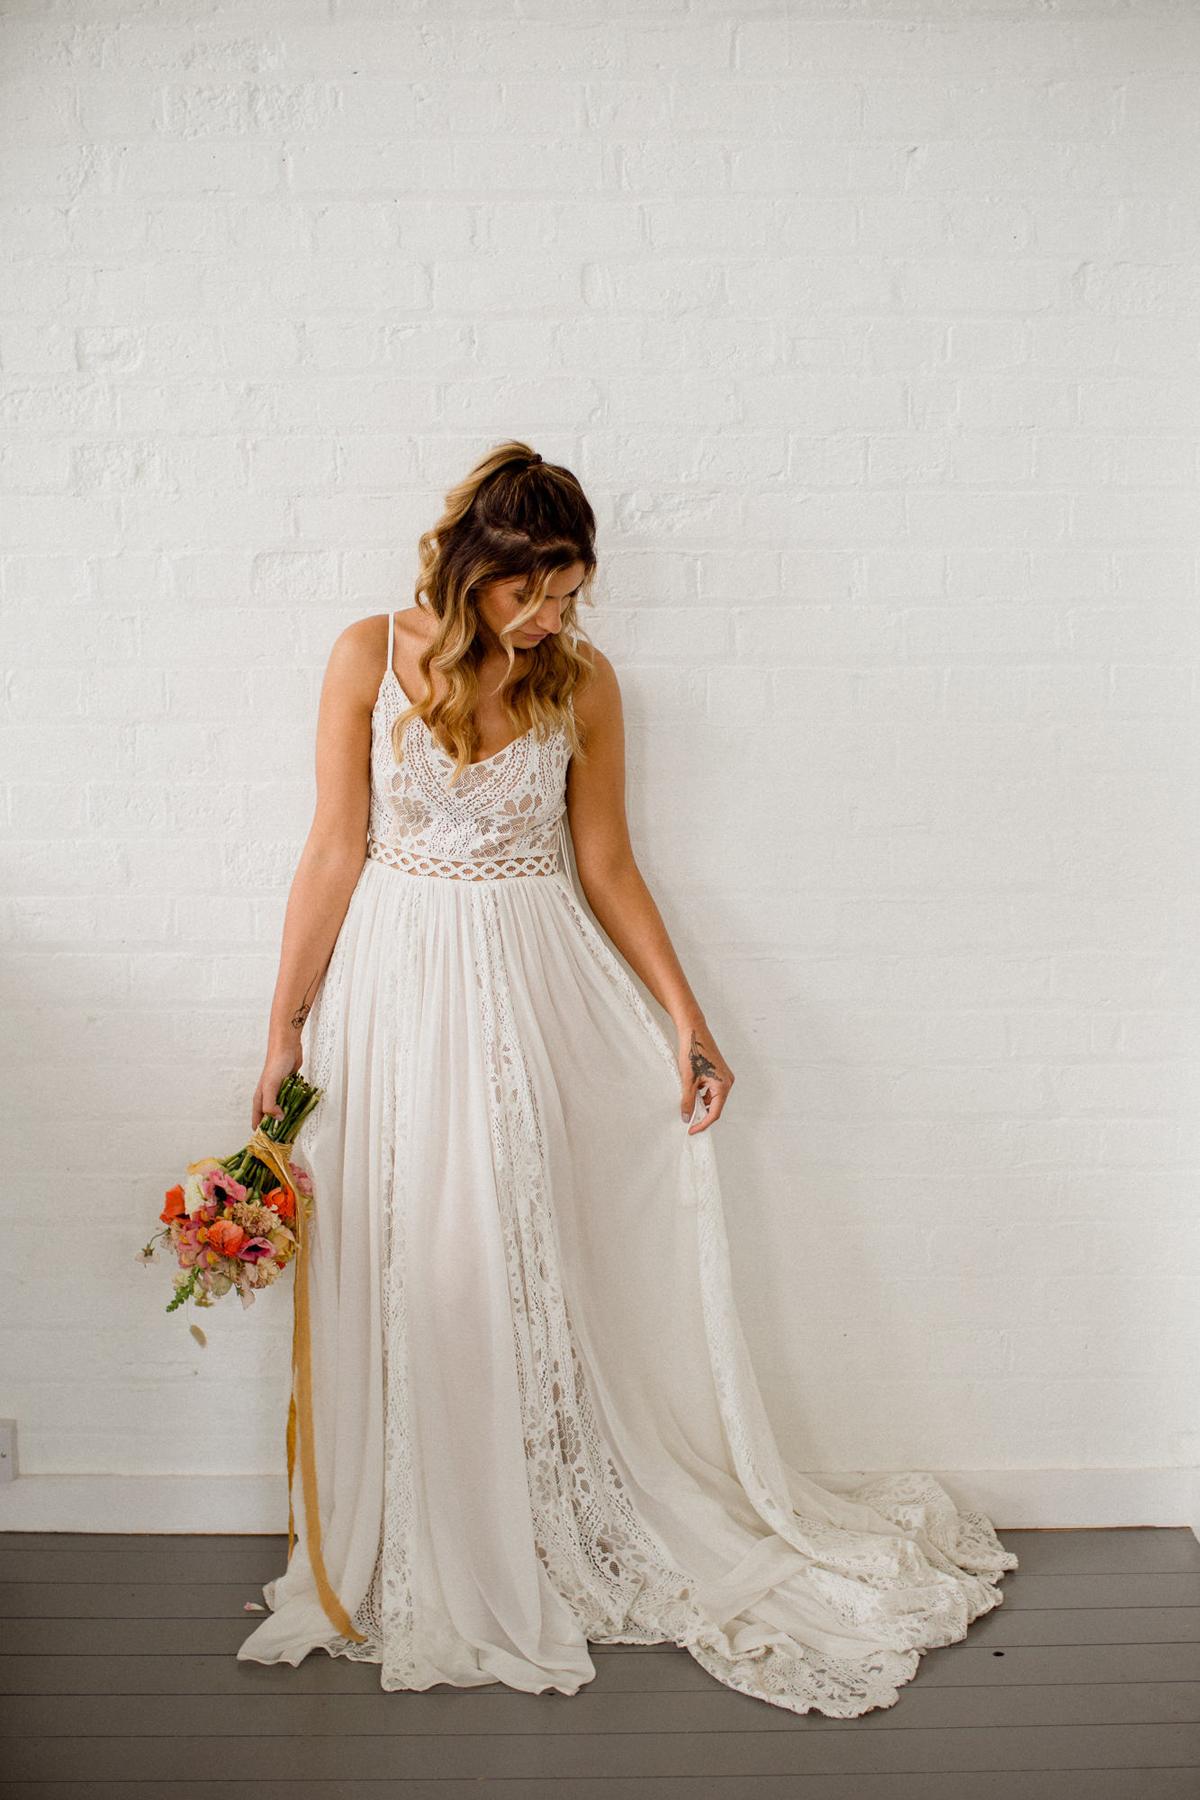 Hazy summer wedding bridal vibes - Hazy Summer Days Bridal Editorial with Anna Campbell + Rish Bridal